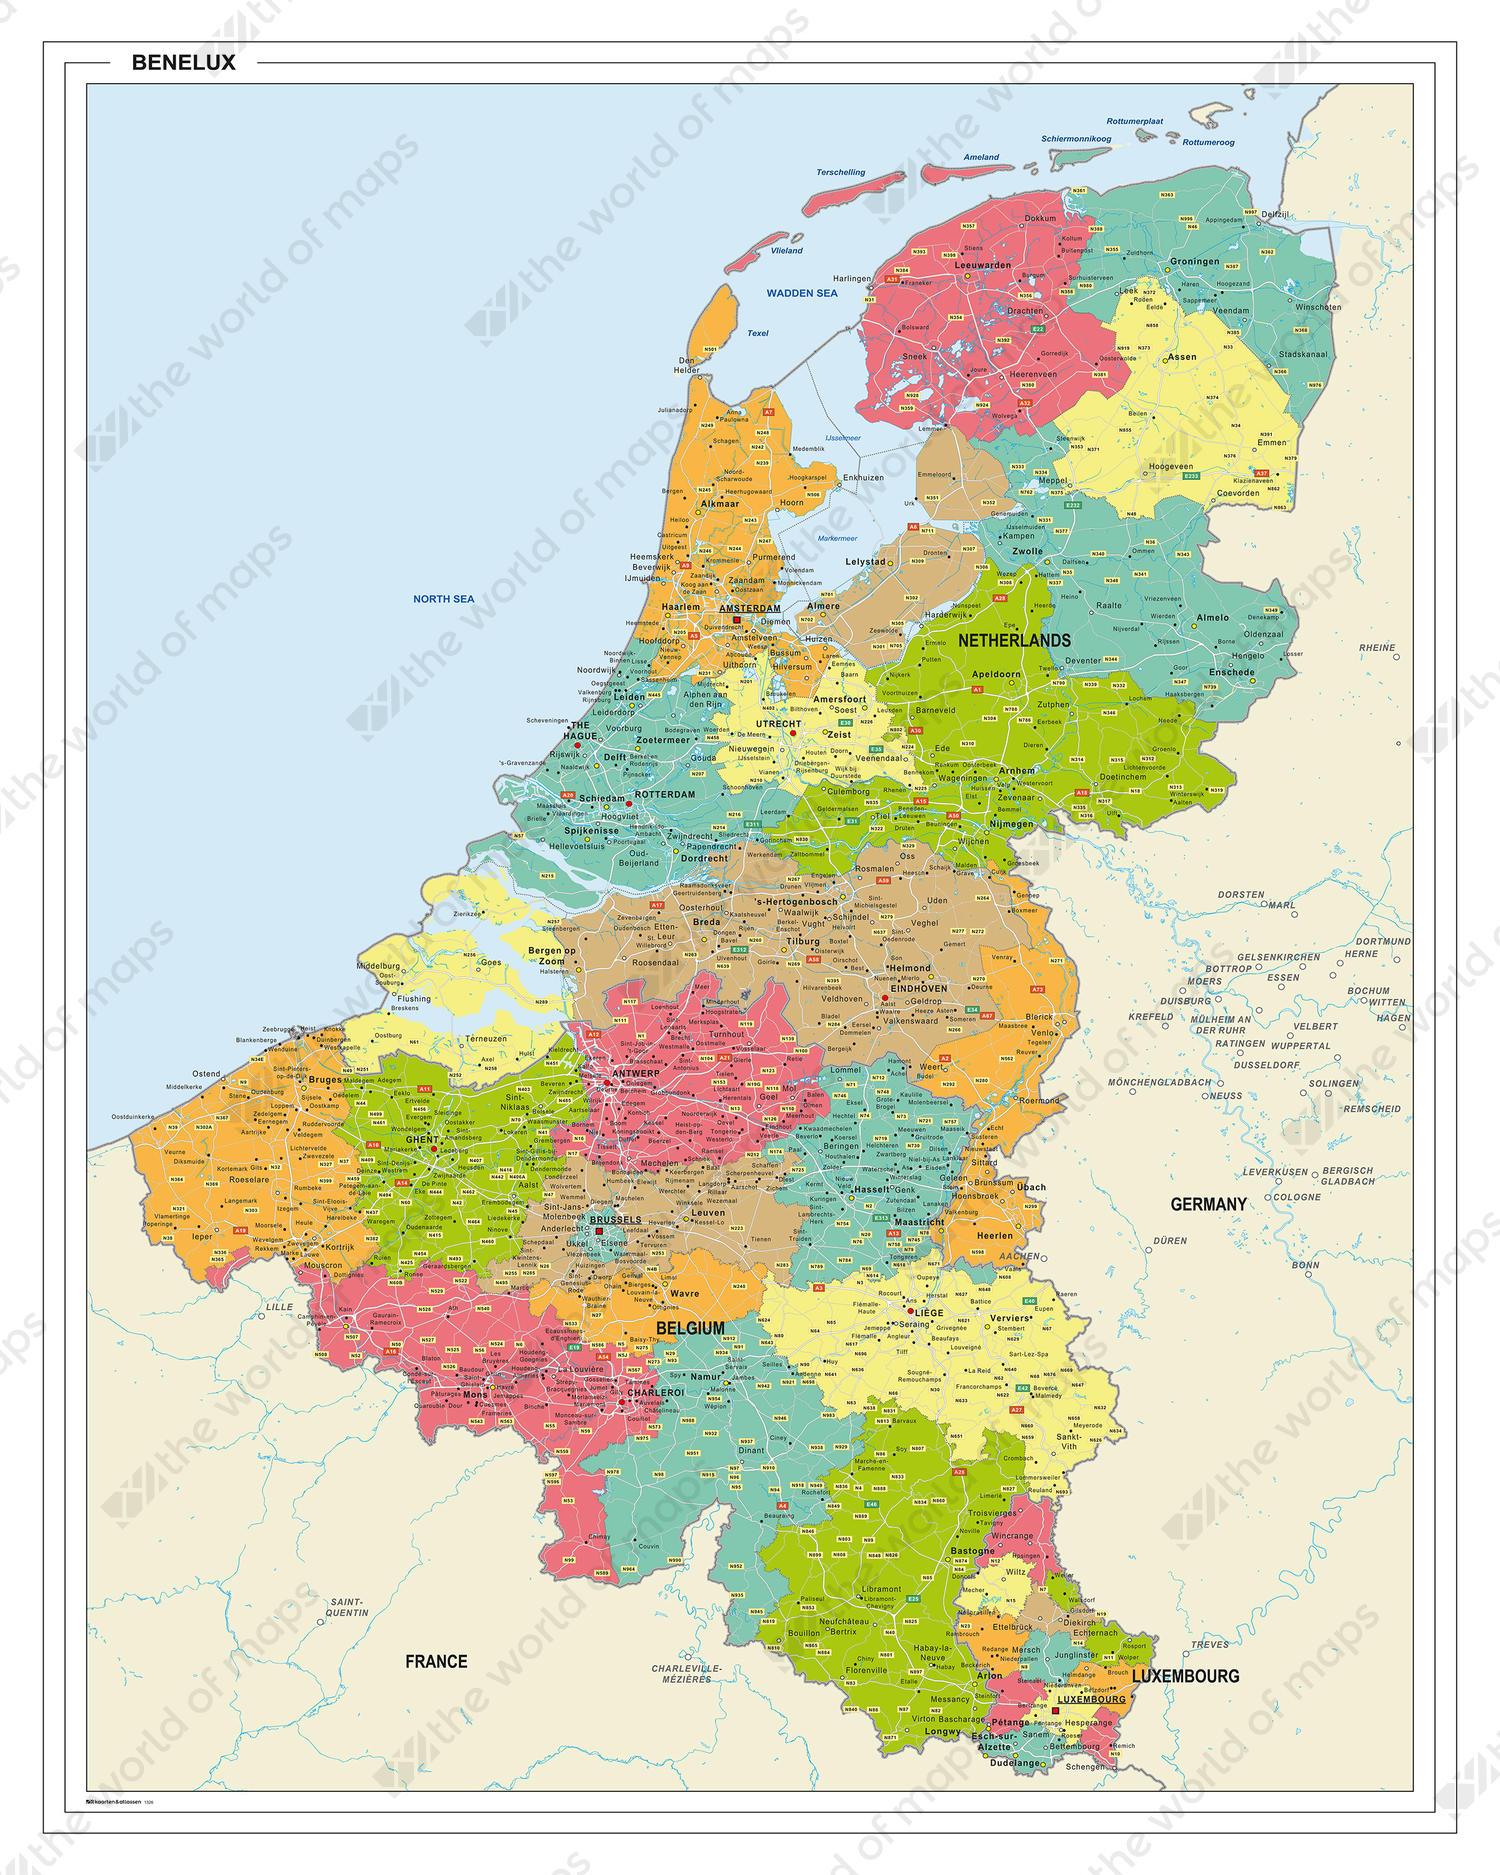 Digital Map Benelux Clorful 1326 The World of Mapscom